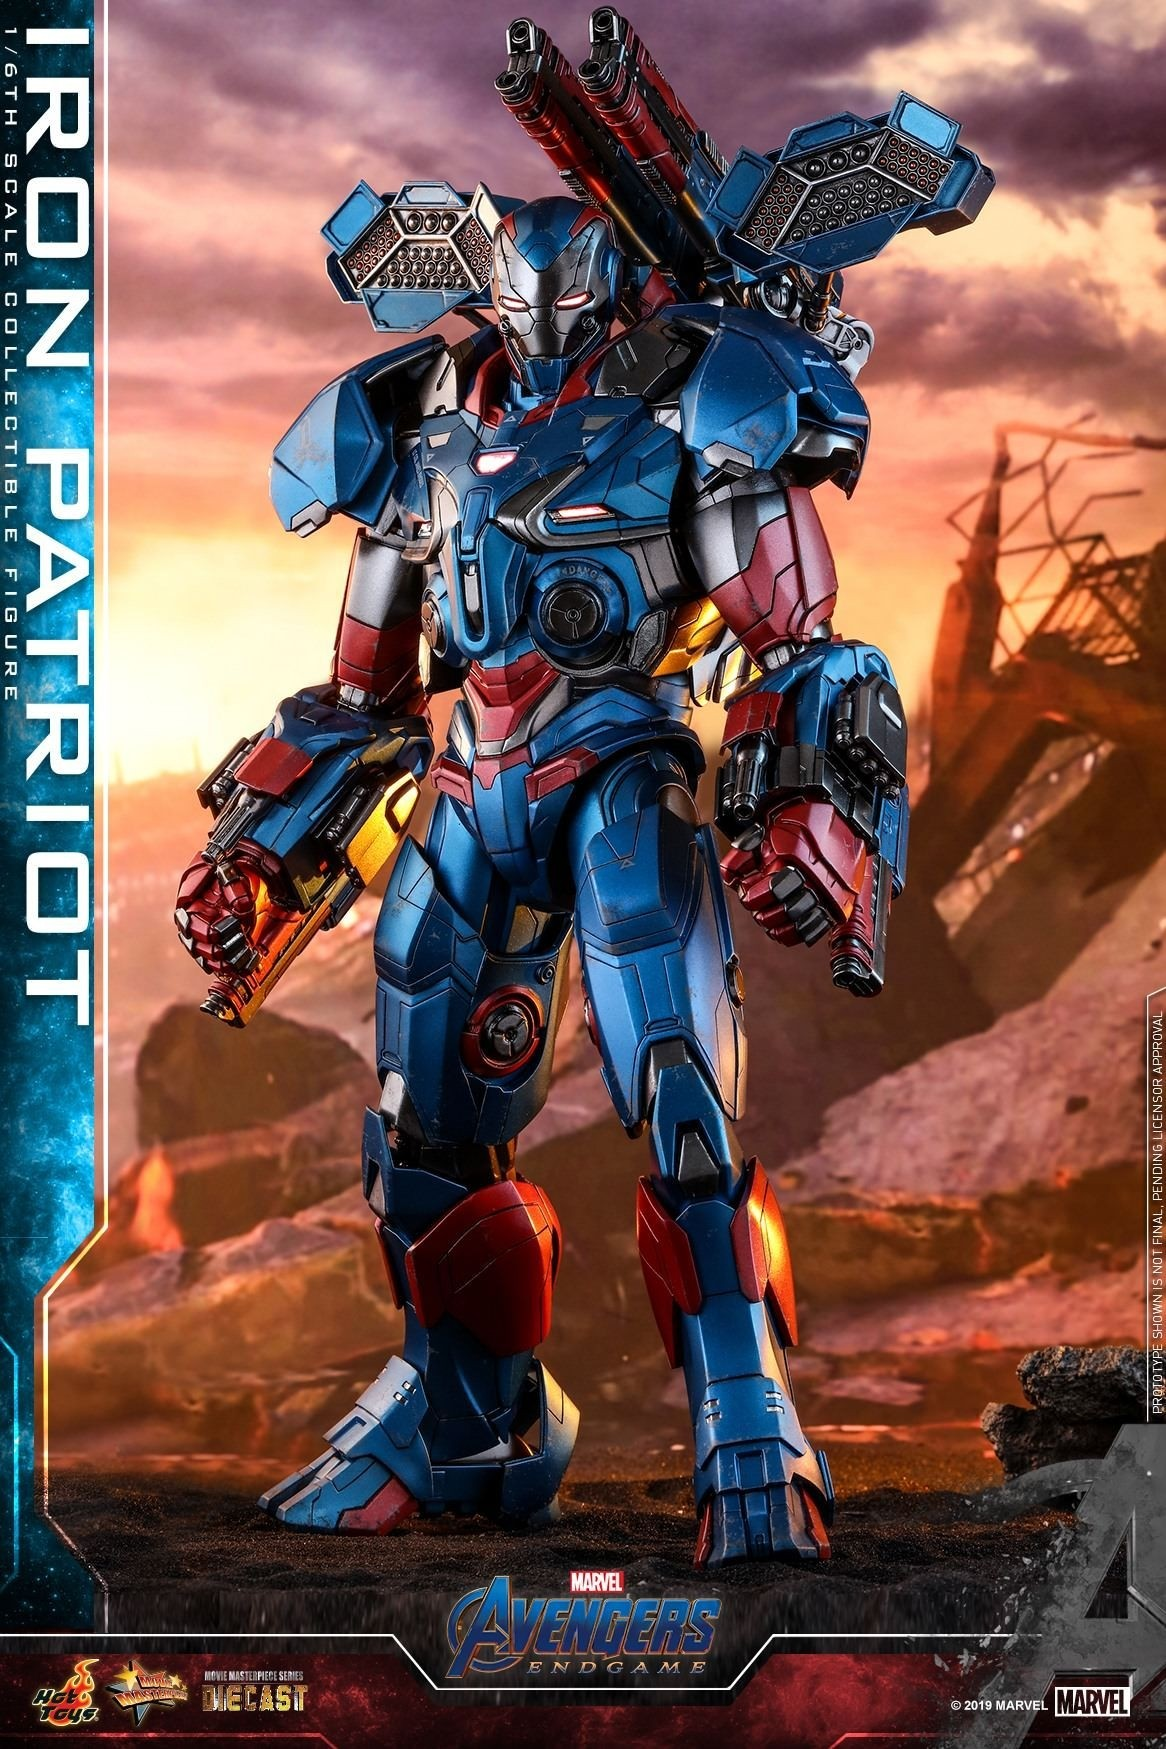 Hot Toys Avengers Endgame Iron Patriot Mms547 D34 1 6th